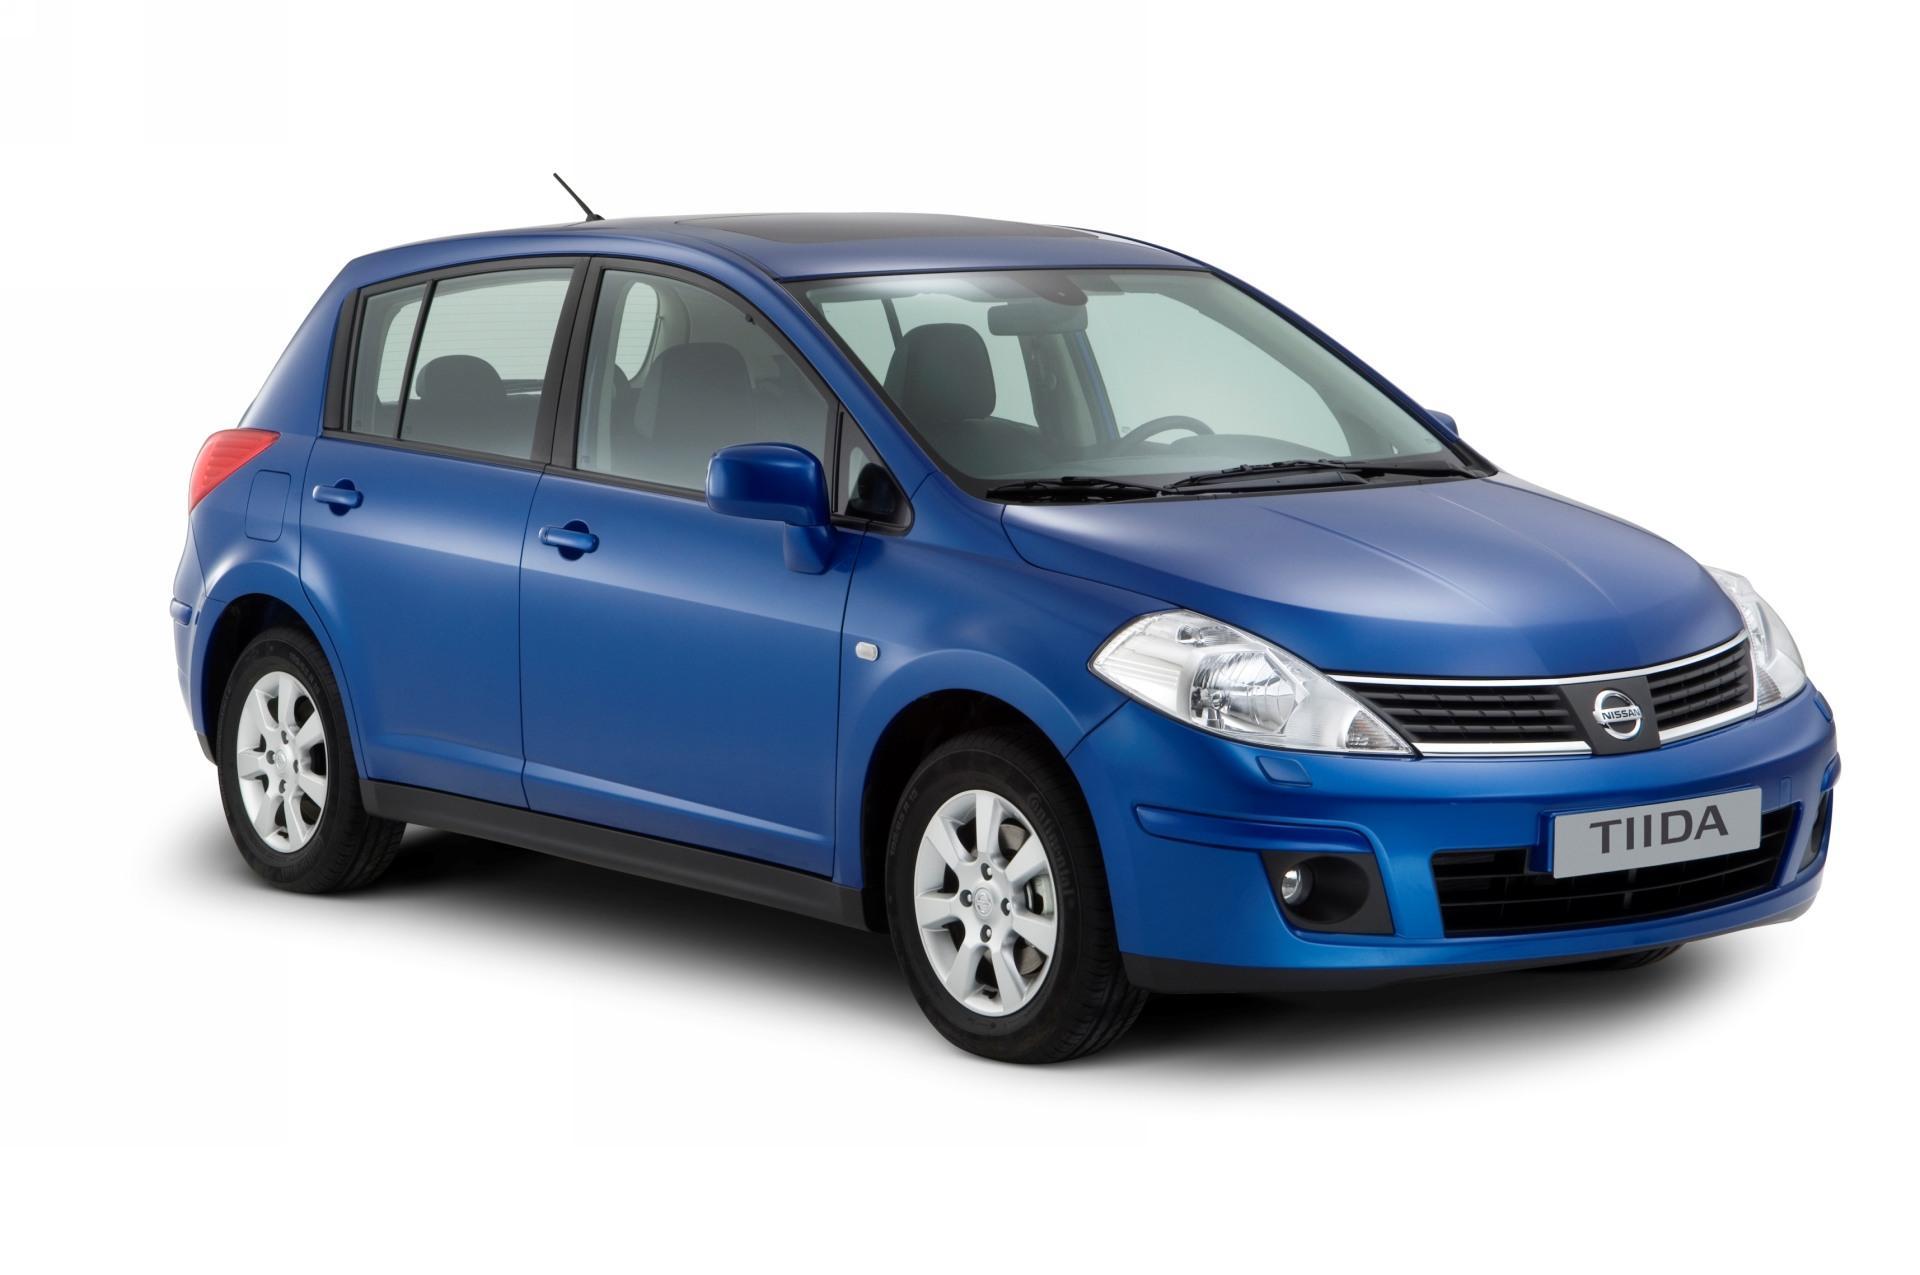 2008 Nissan Tiida News And Information Conceptcarz Com